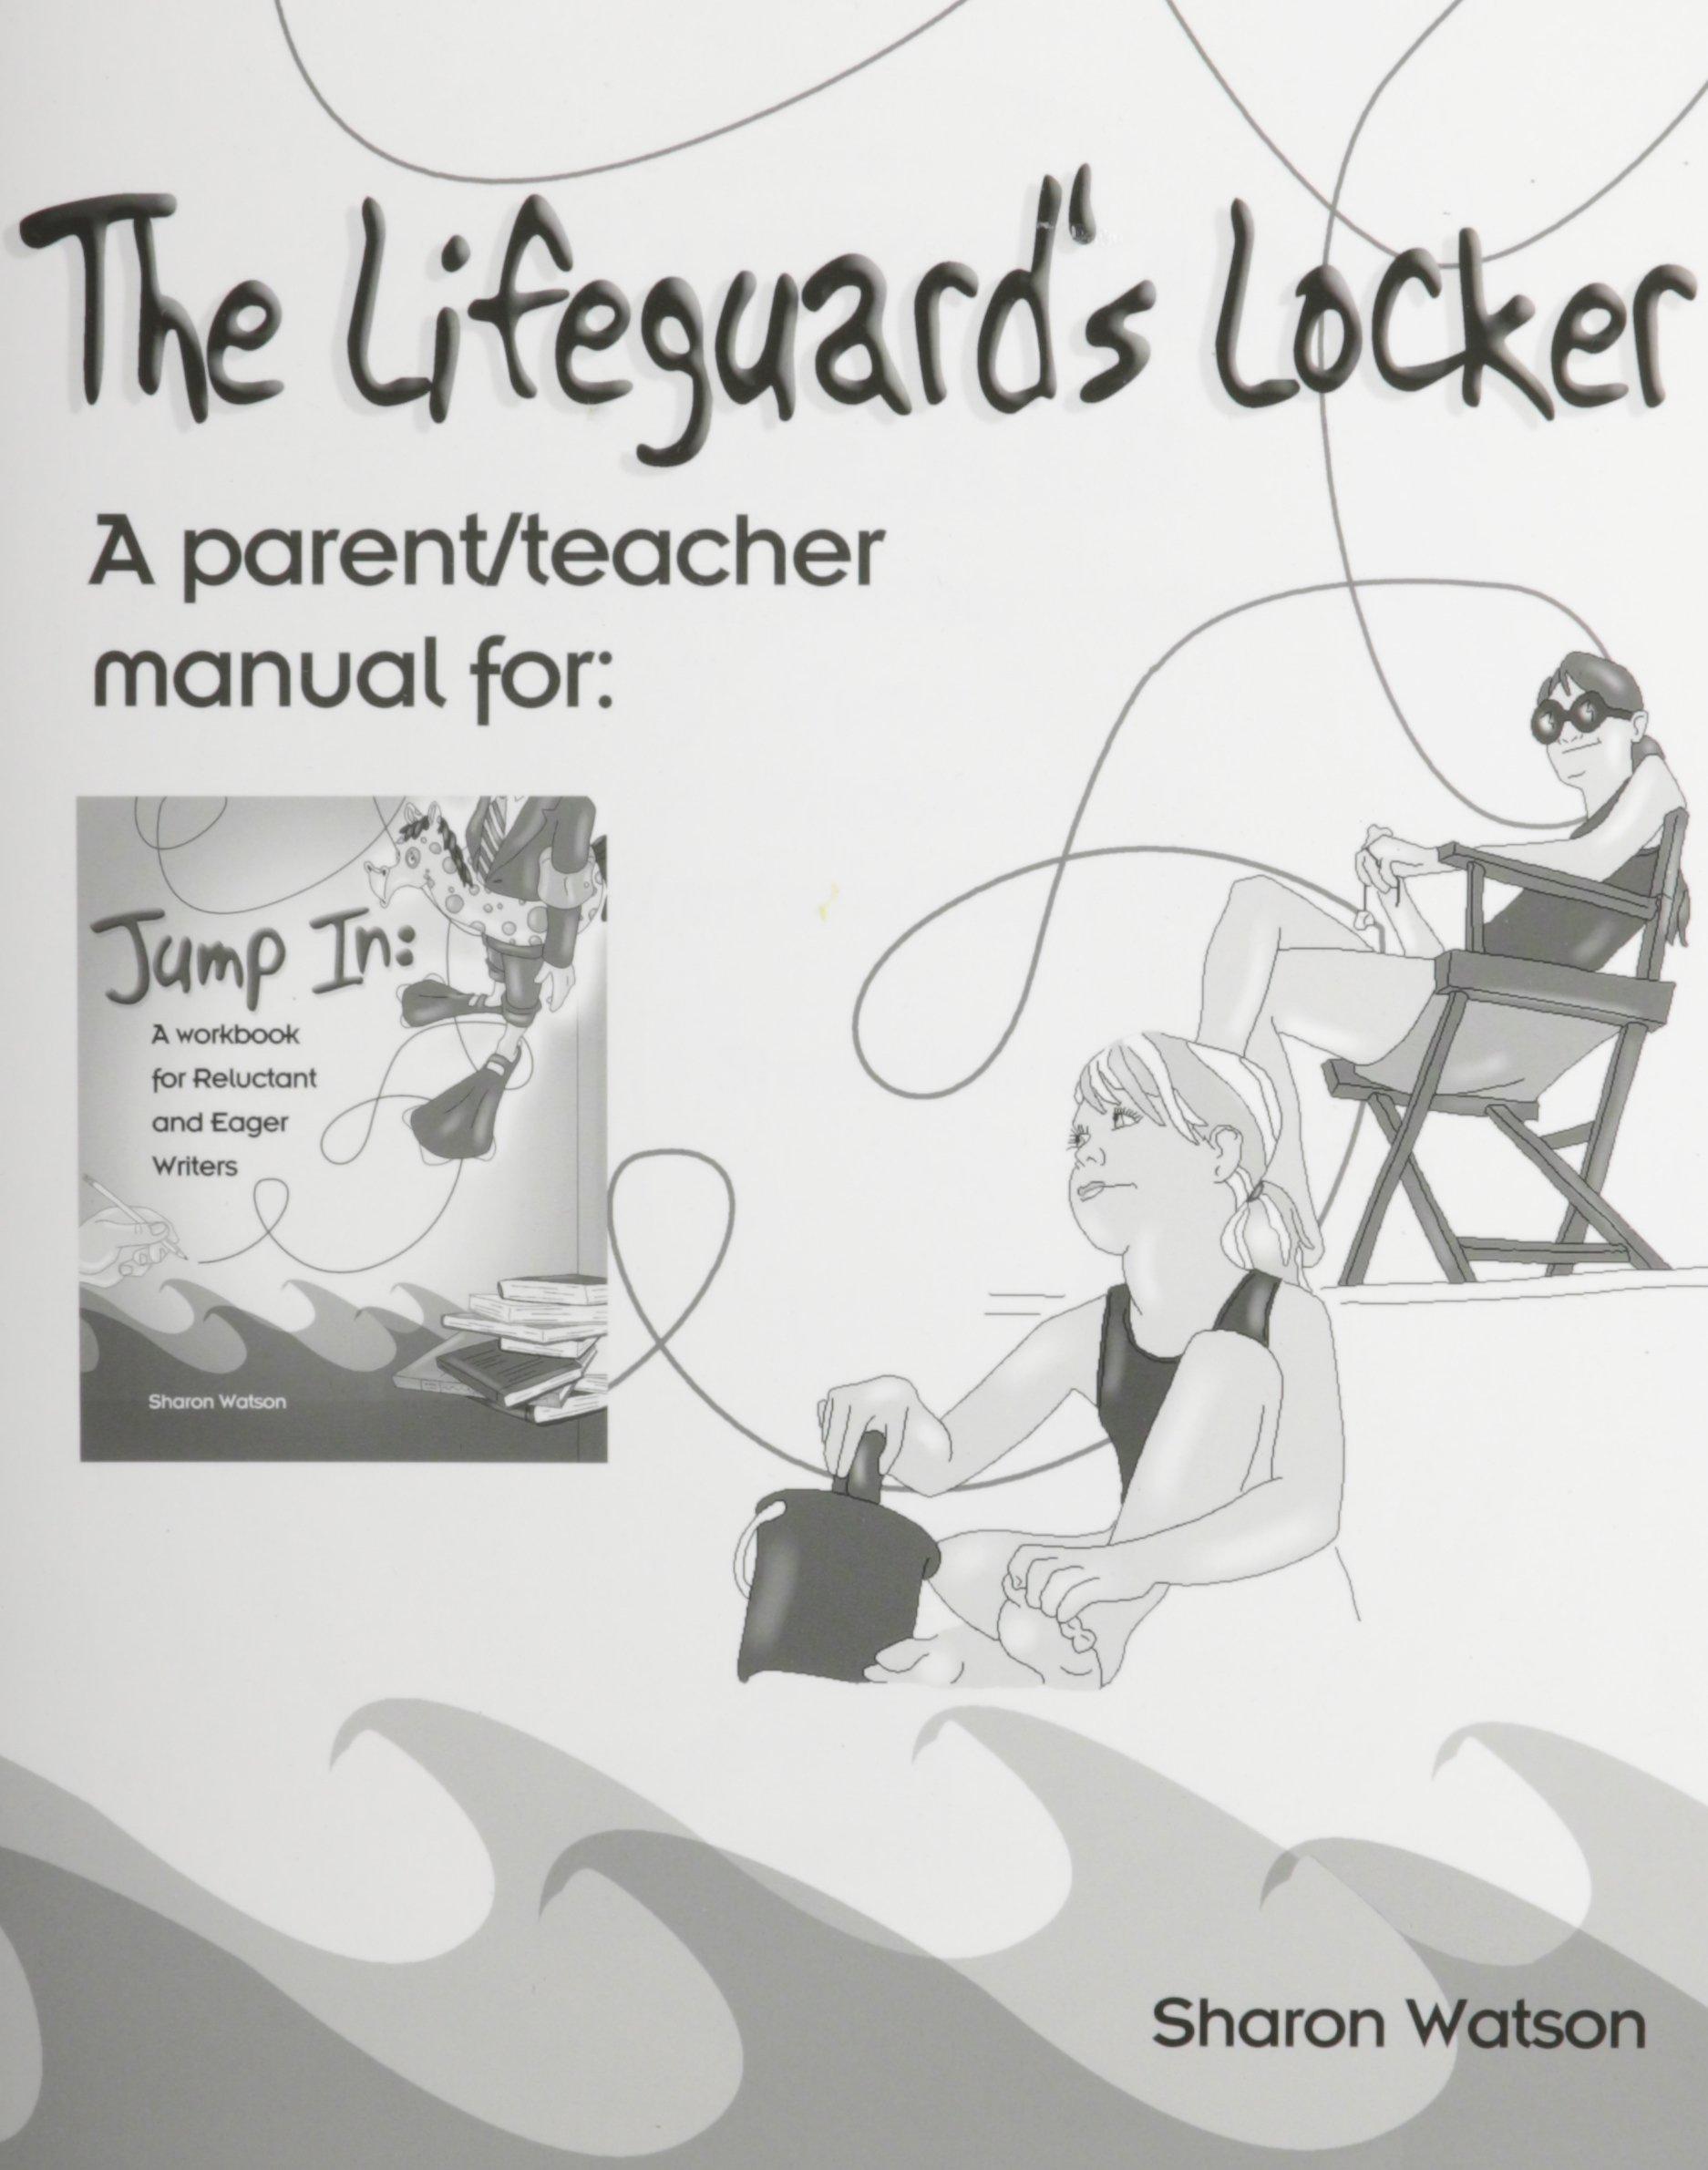 The Lifeguard's Locker ebook